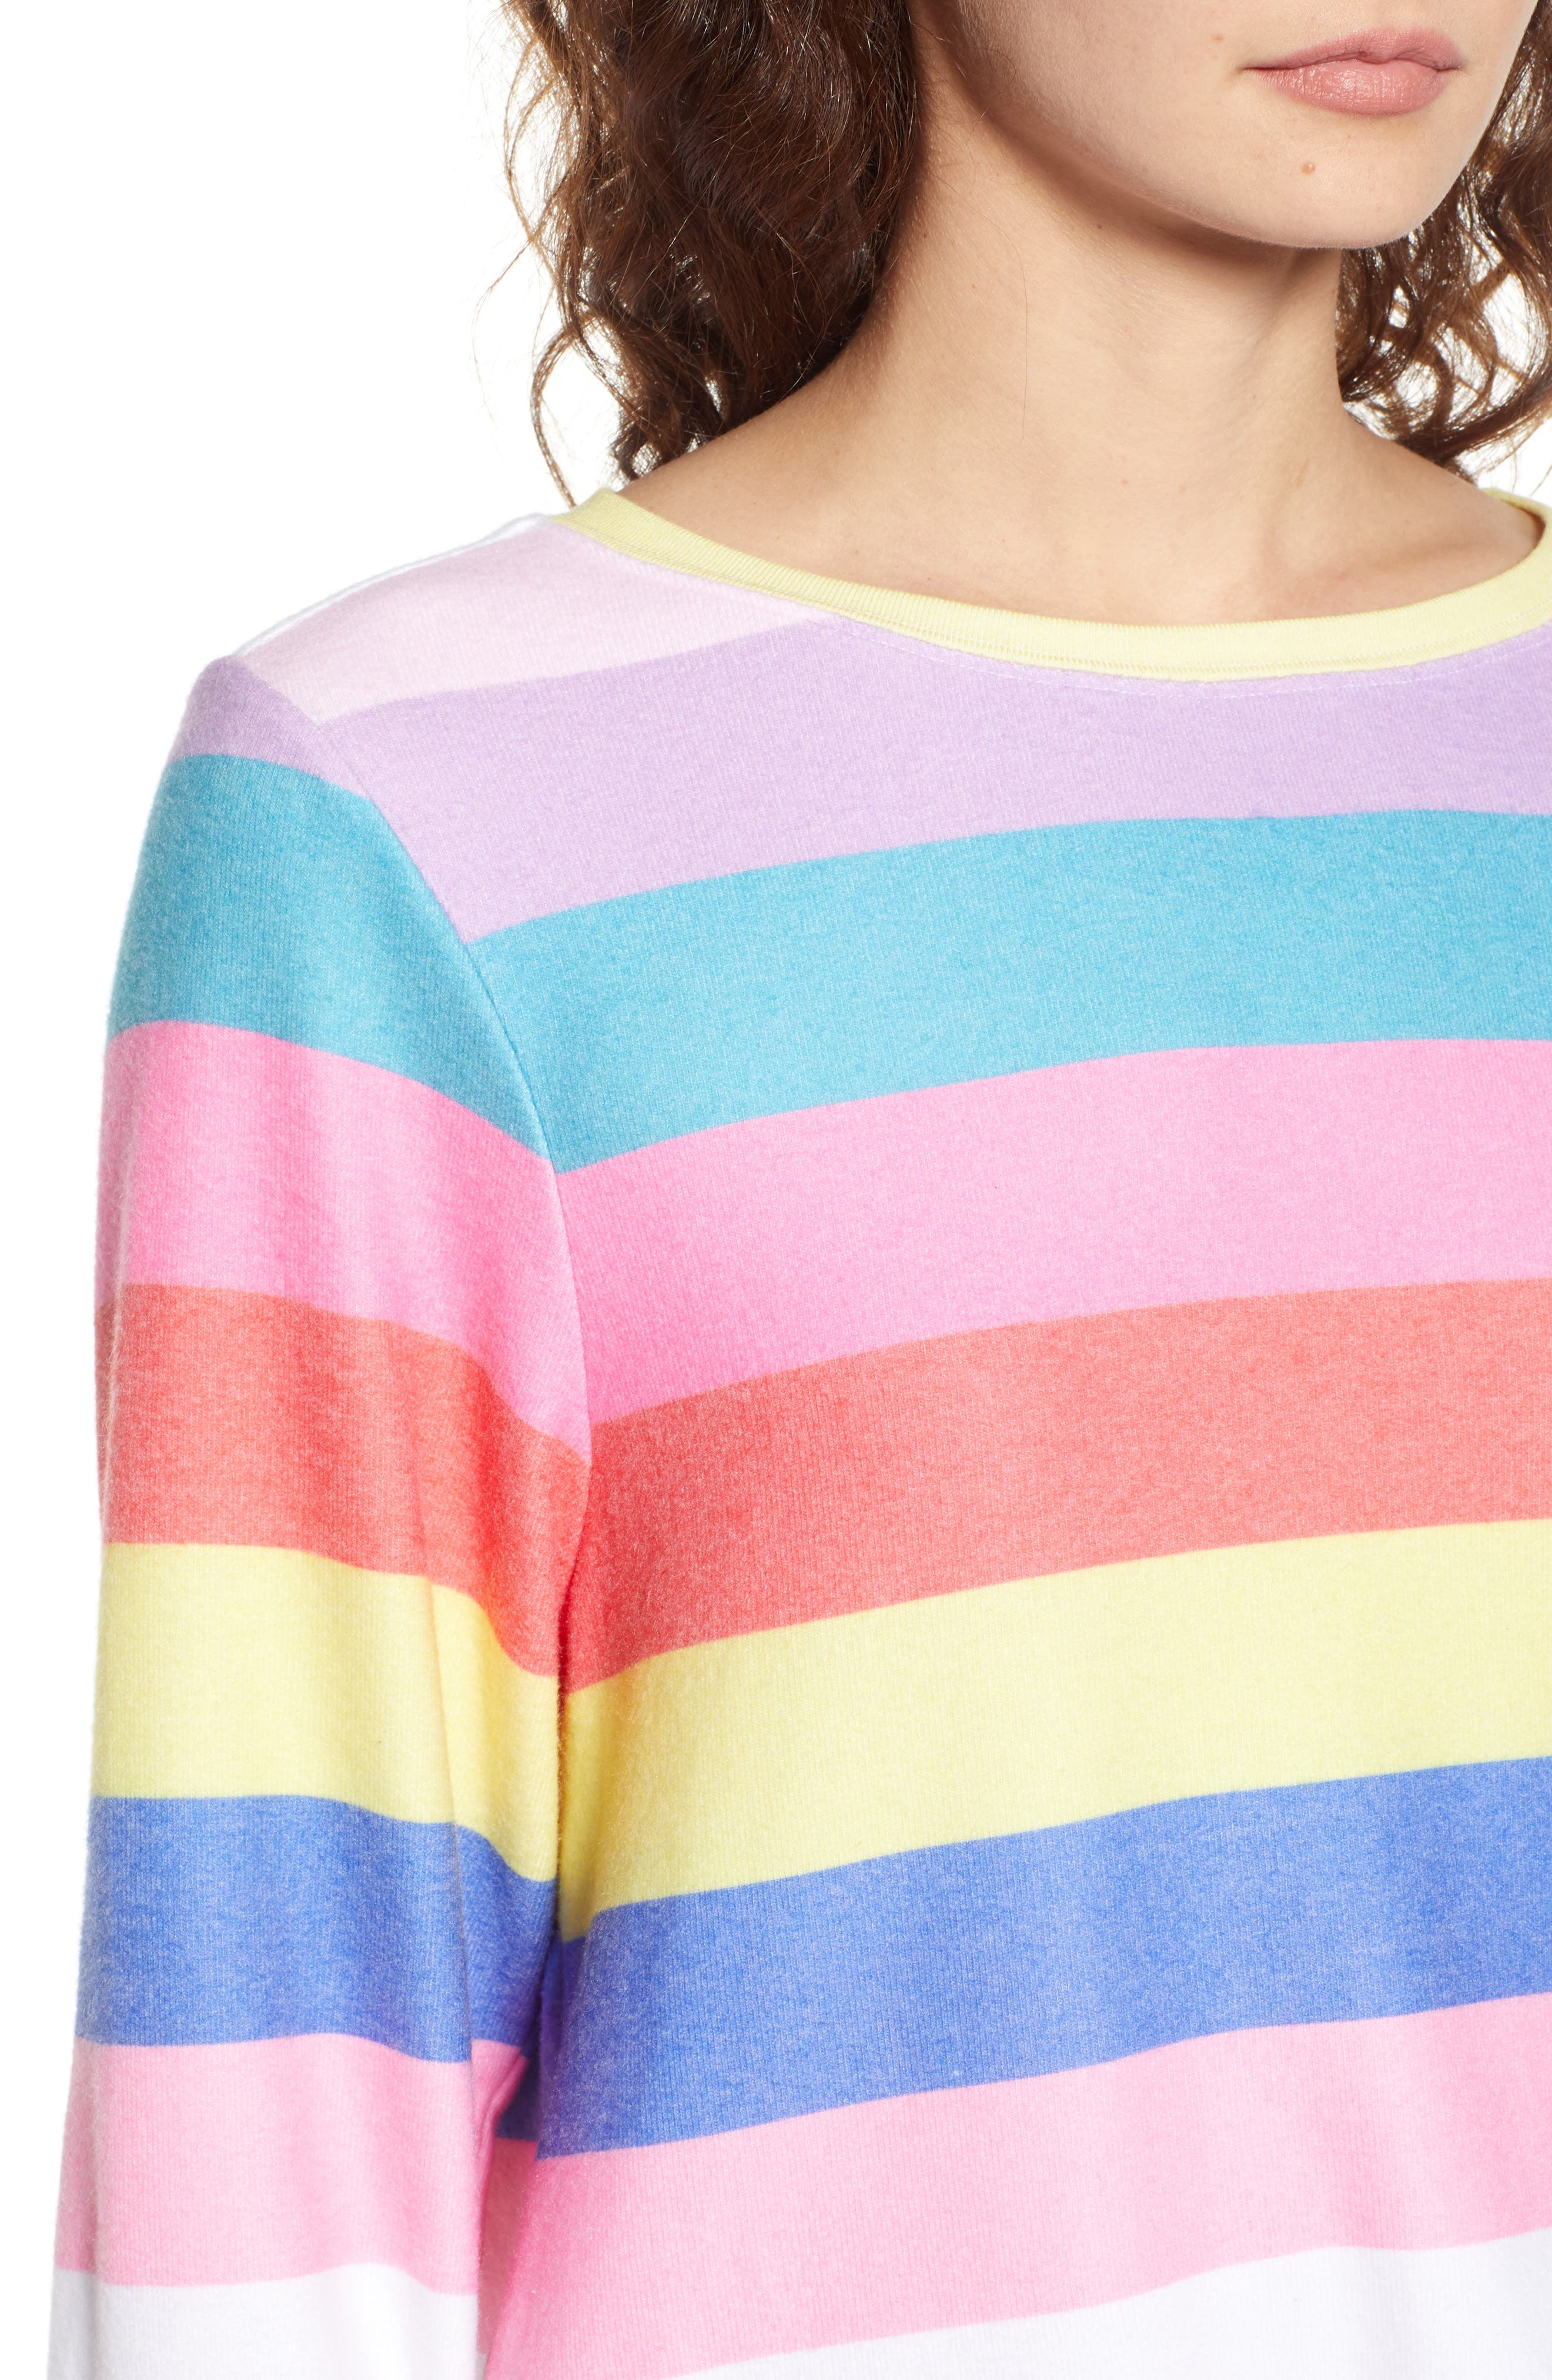 Castaway Roadtrip Sweatshirt,                             Alternate thumbnail 4, color,                             650